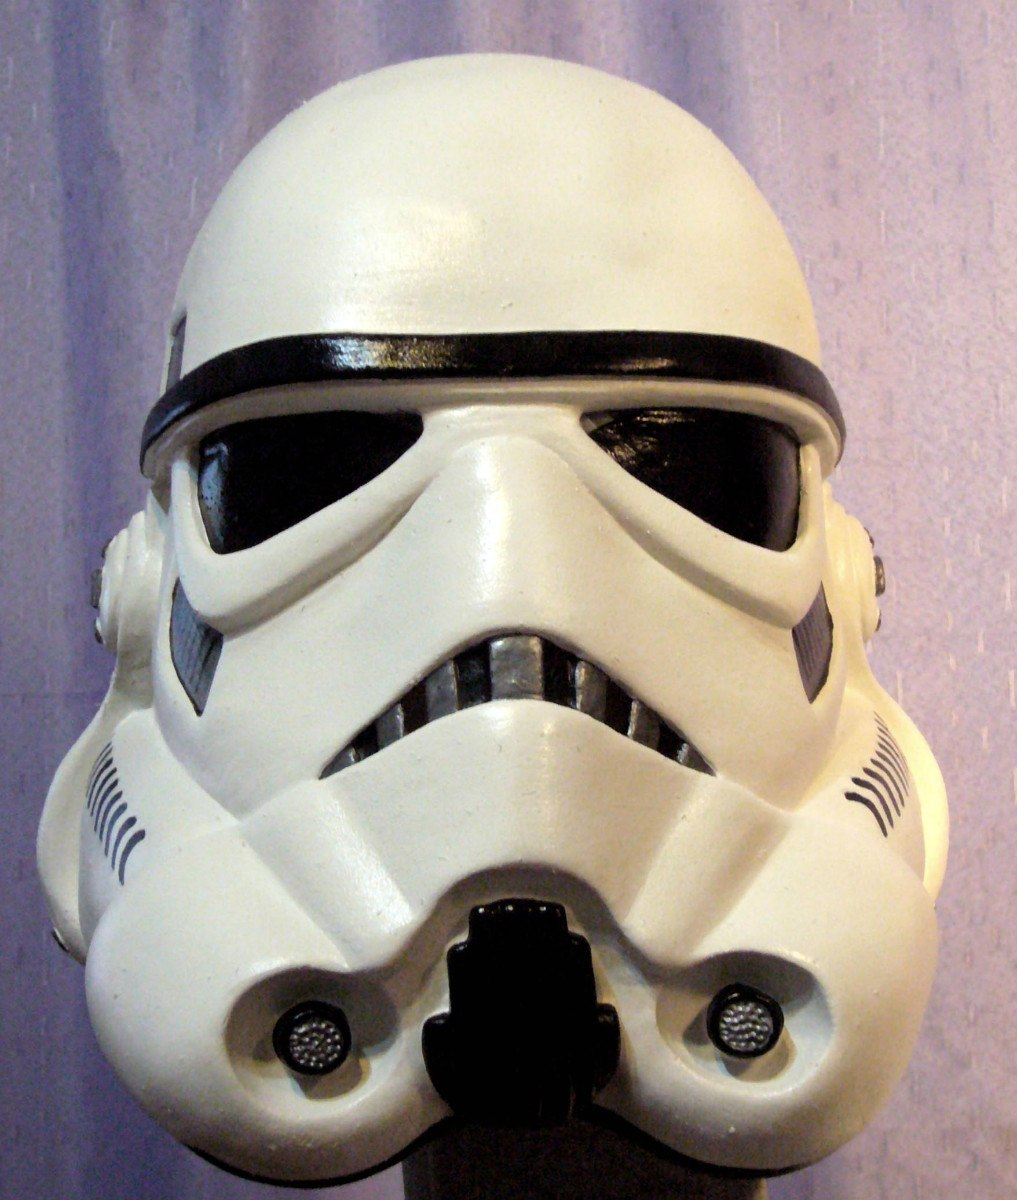 ¿Que reloj llevamos hoy? - Página 6 Mascara-latex-stormtrooper-star-wars-soldado-imperial-luke-4158-MLA142766671_2355-F